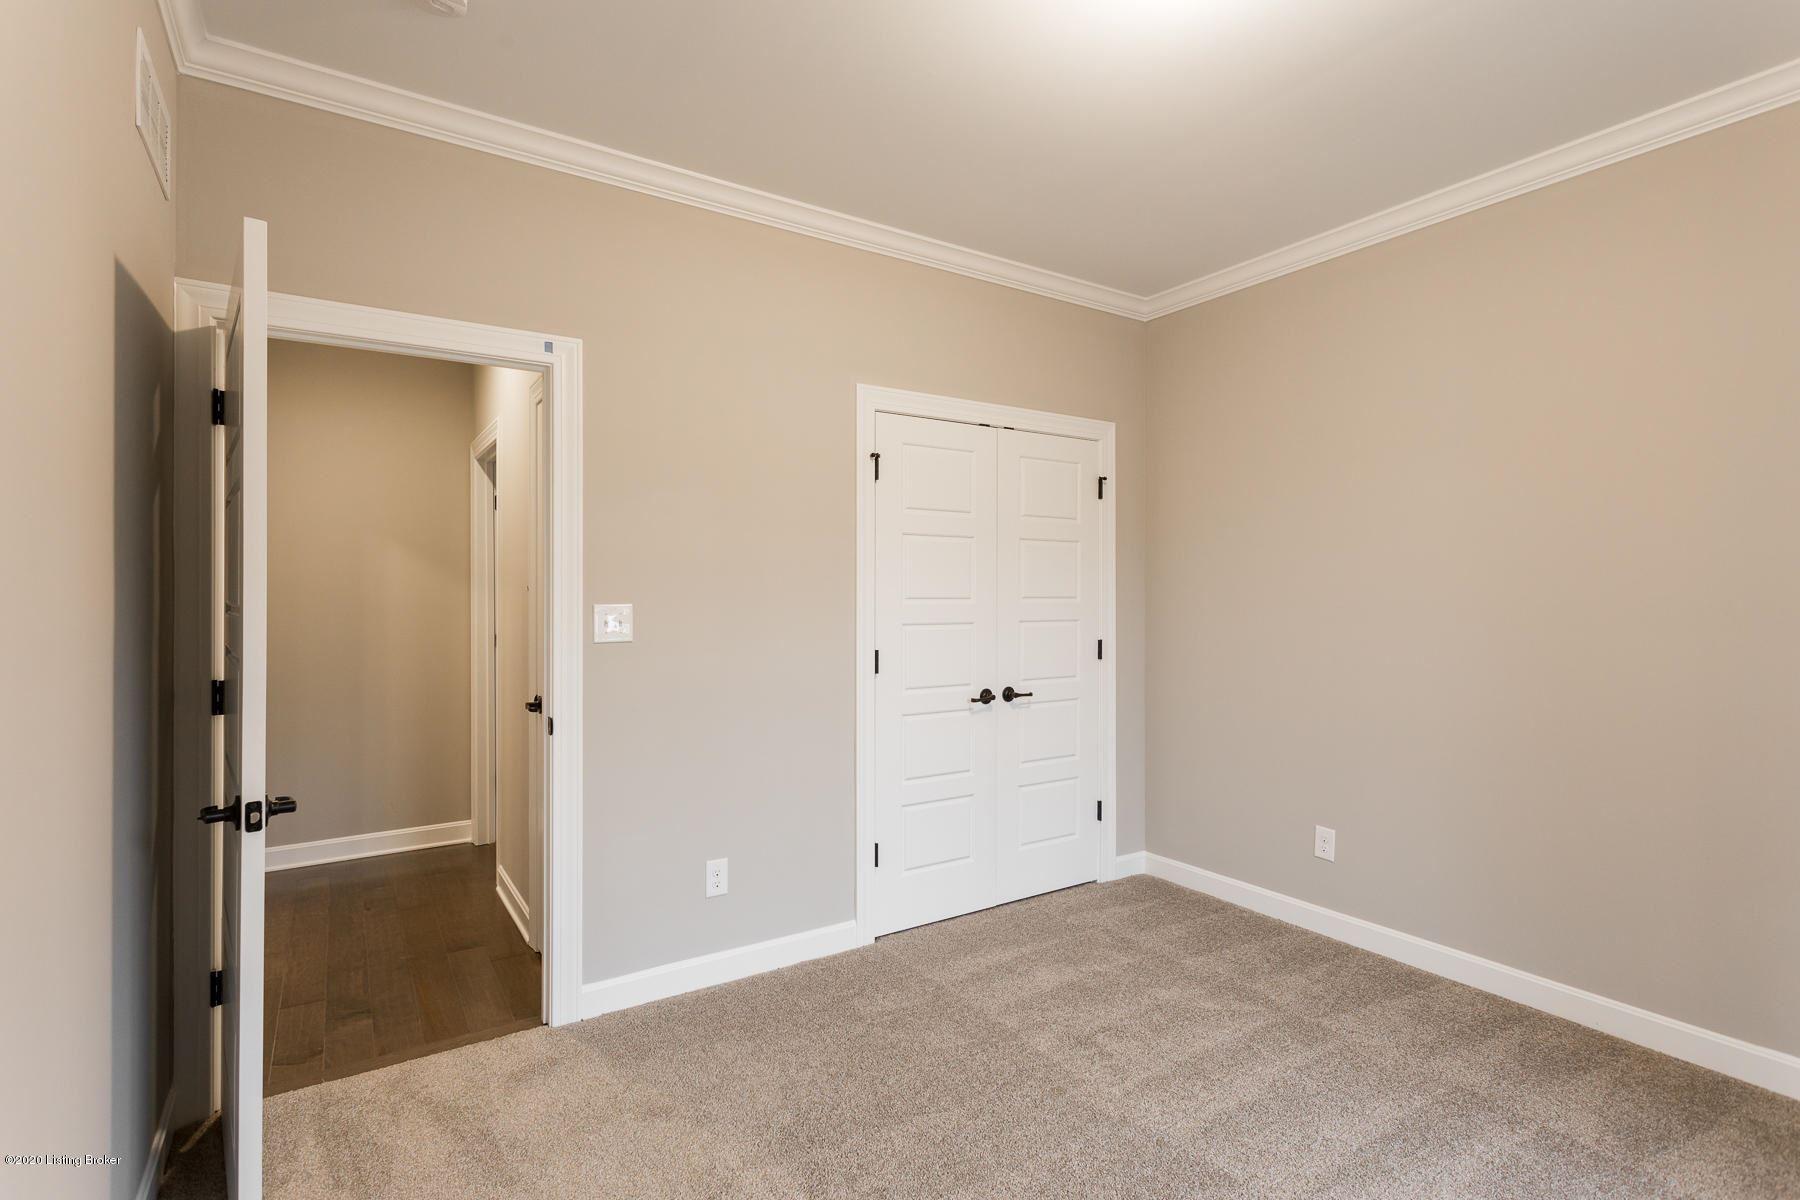 Property Image Of 9303 Cross Meadows Cir In Louisville, Ky